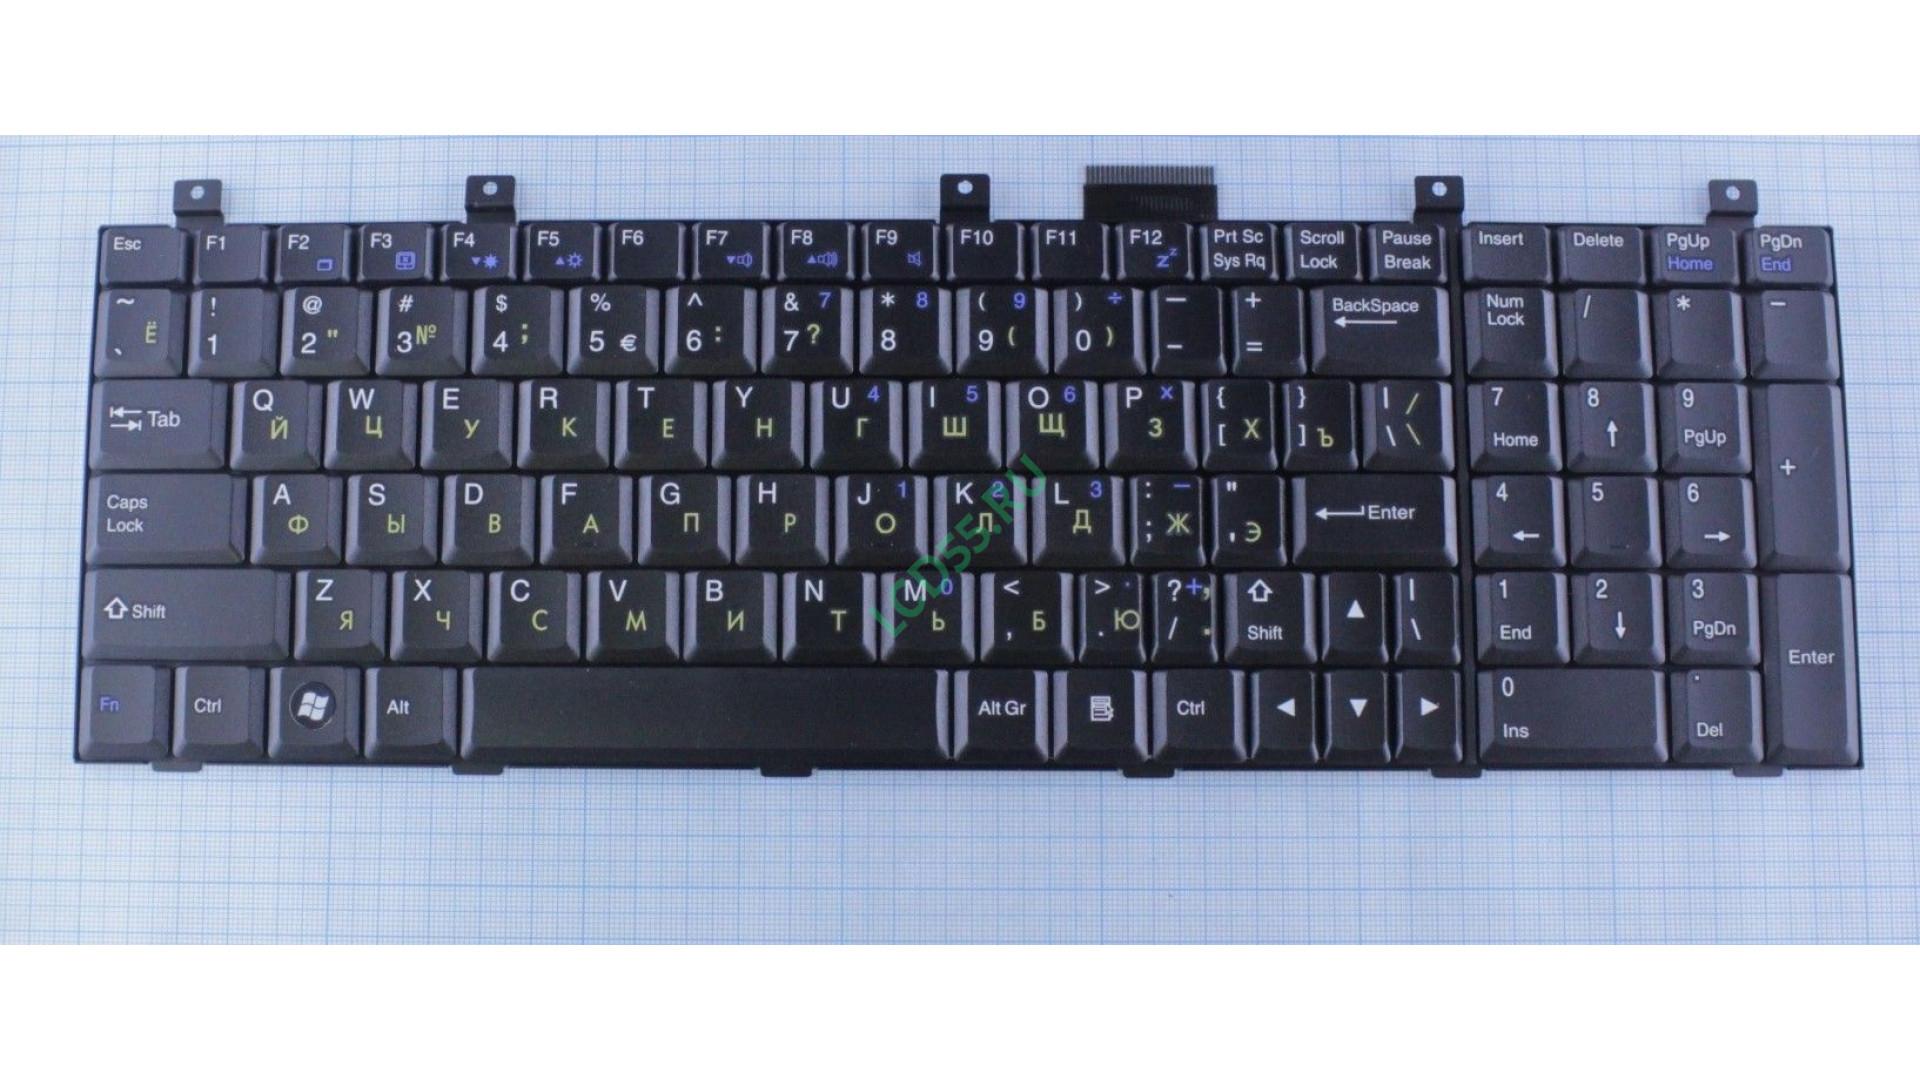 Клавиатура MSI CX500, CX600, CX605, CX700, EX620, EX630, VR610, VX600 (черная)